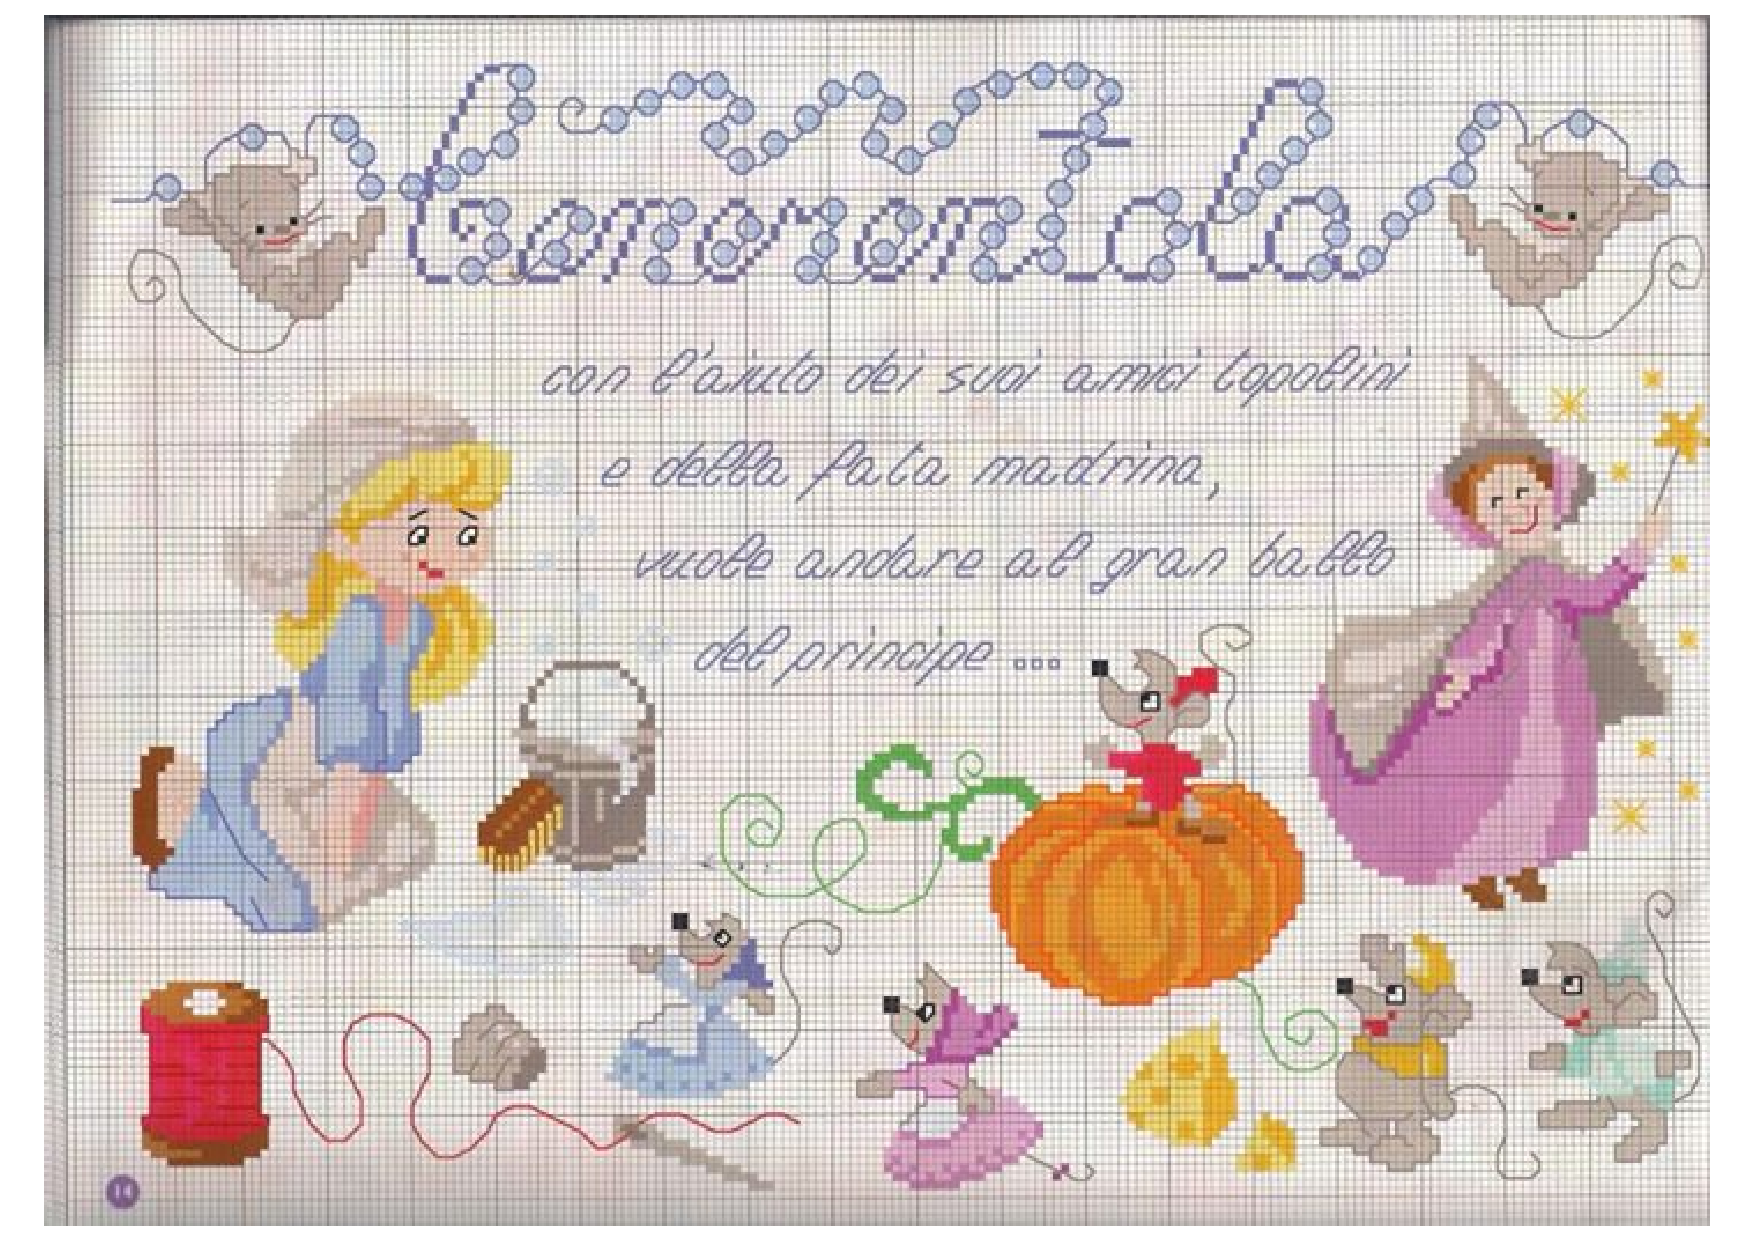 Popolare Fiaba Cenerentola schema punto croce gratis - magiedifilo.it punto  UB89